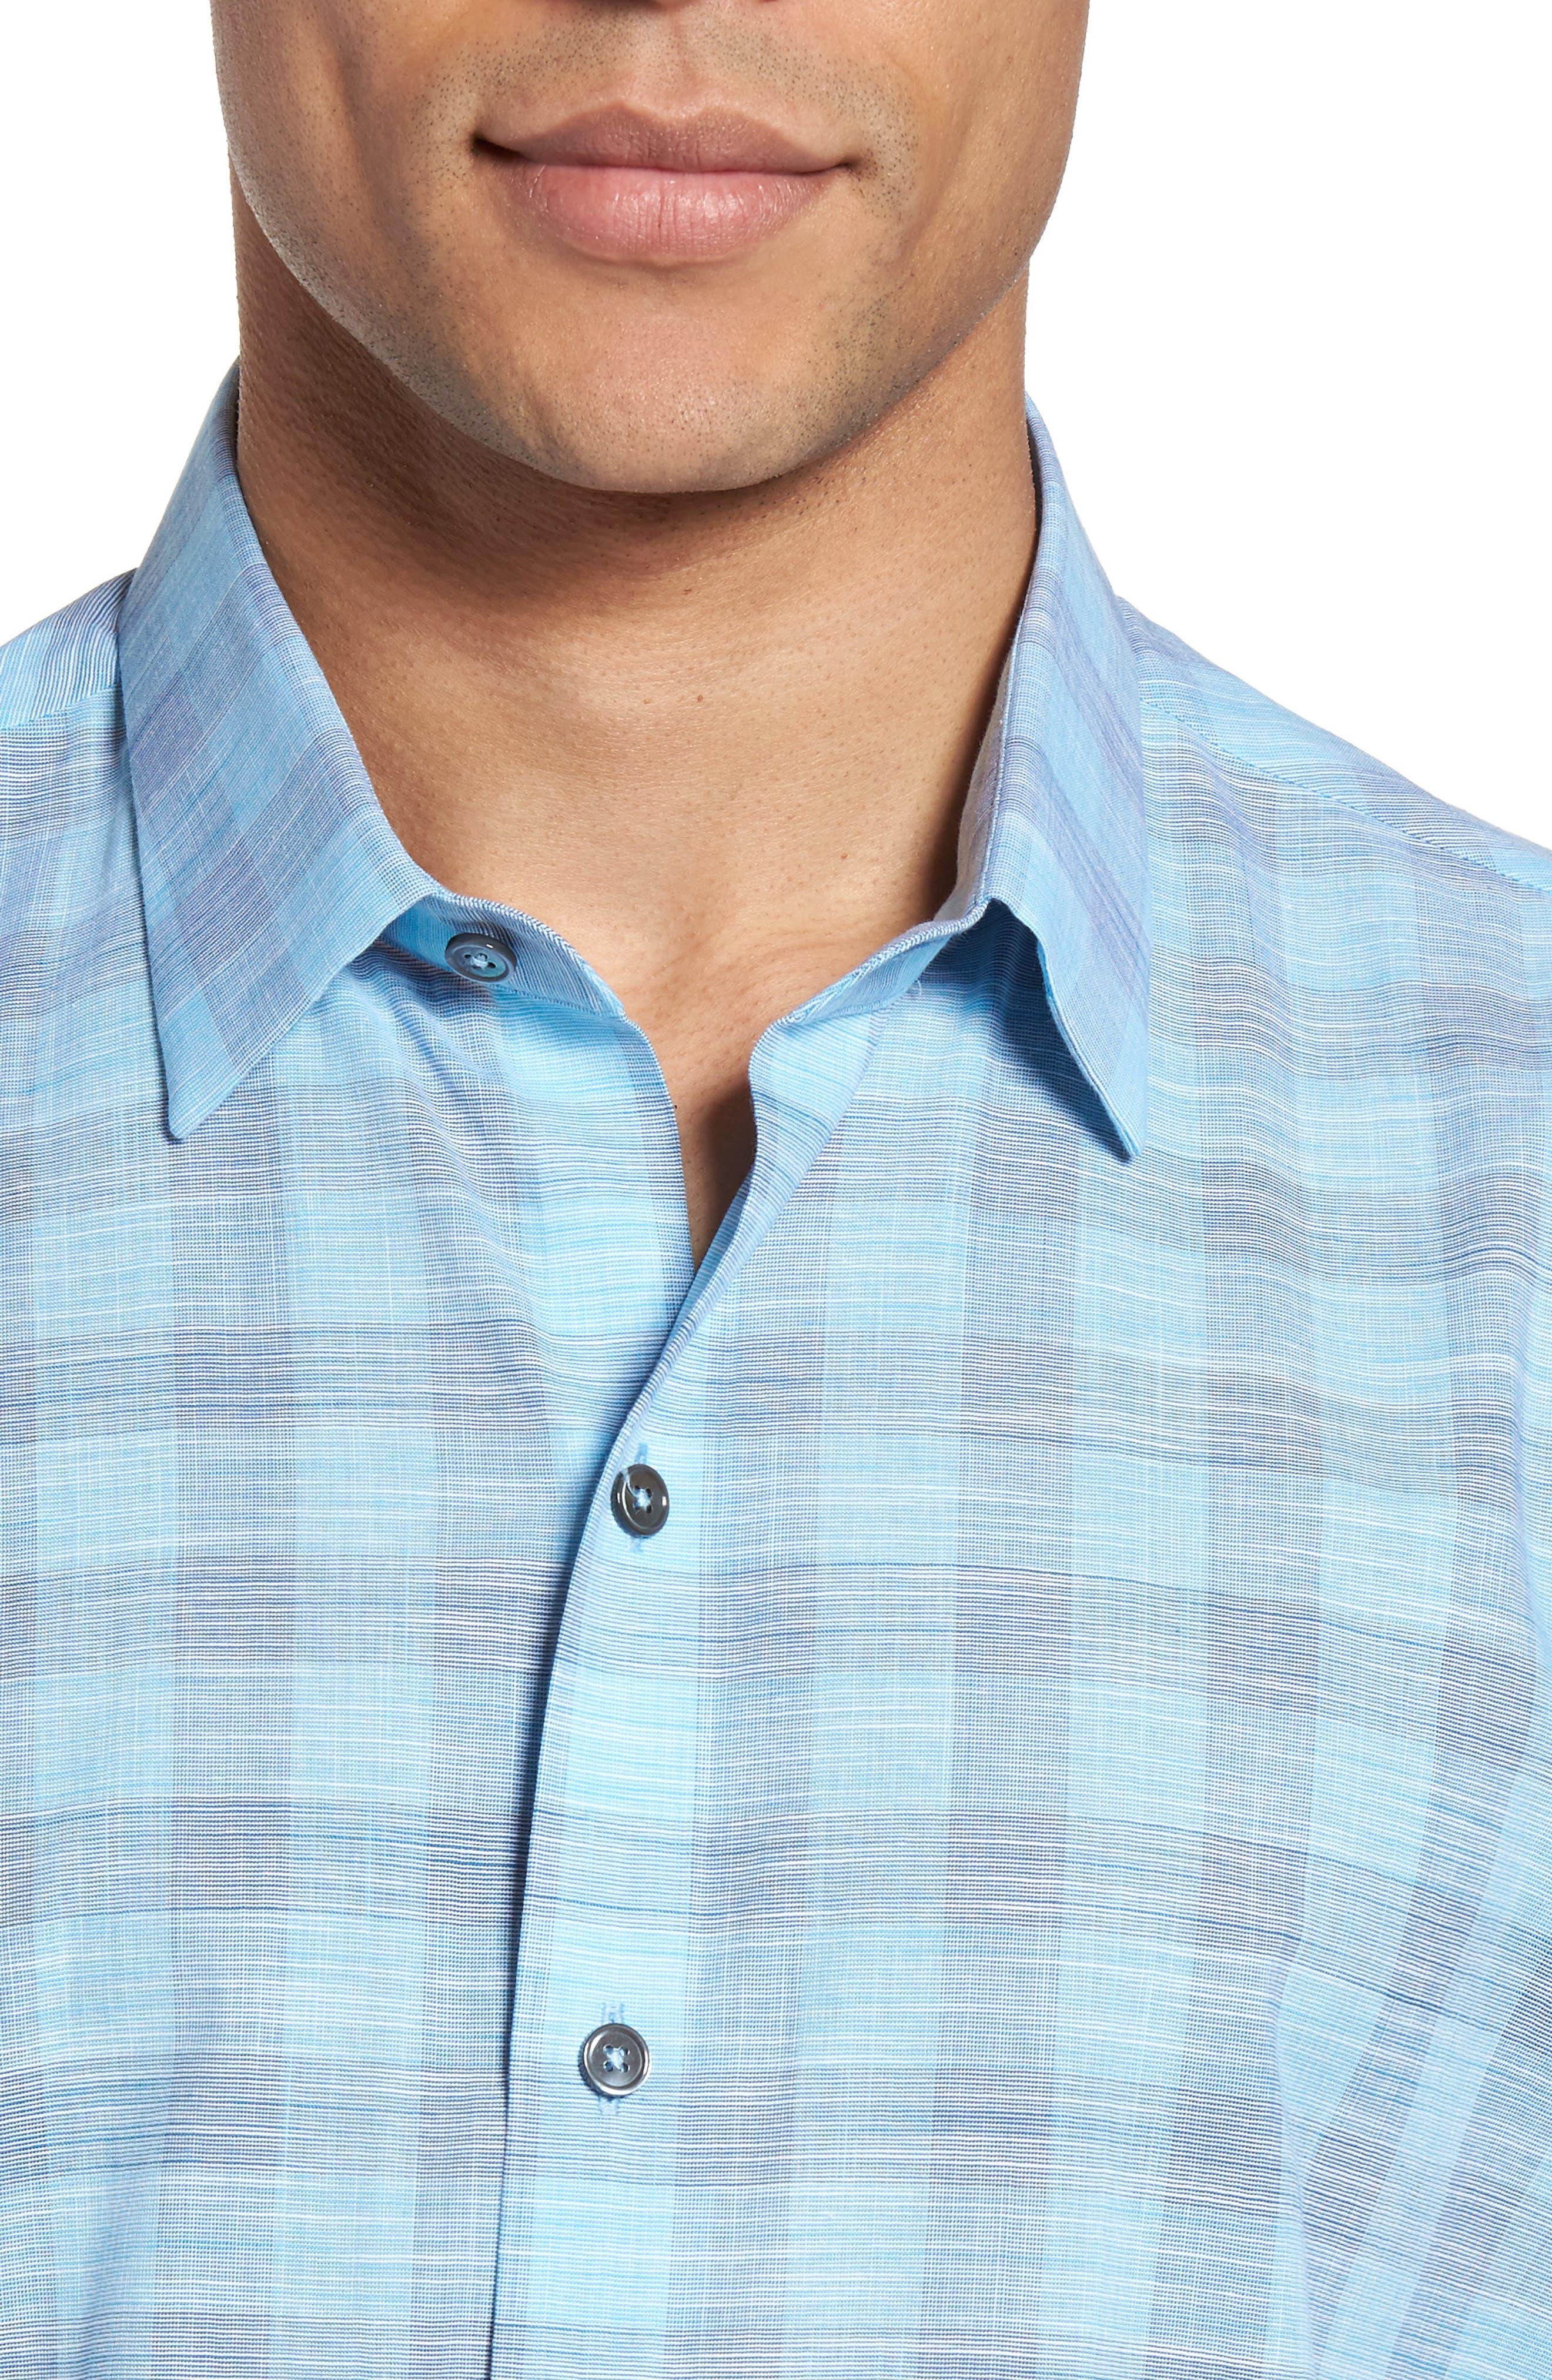 Hasanagic Trim Fit Plaid Sport Shirt,                             Alternate thumbnail 4, color,                             Turquoise